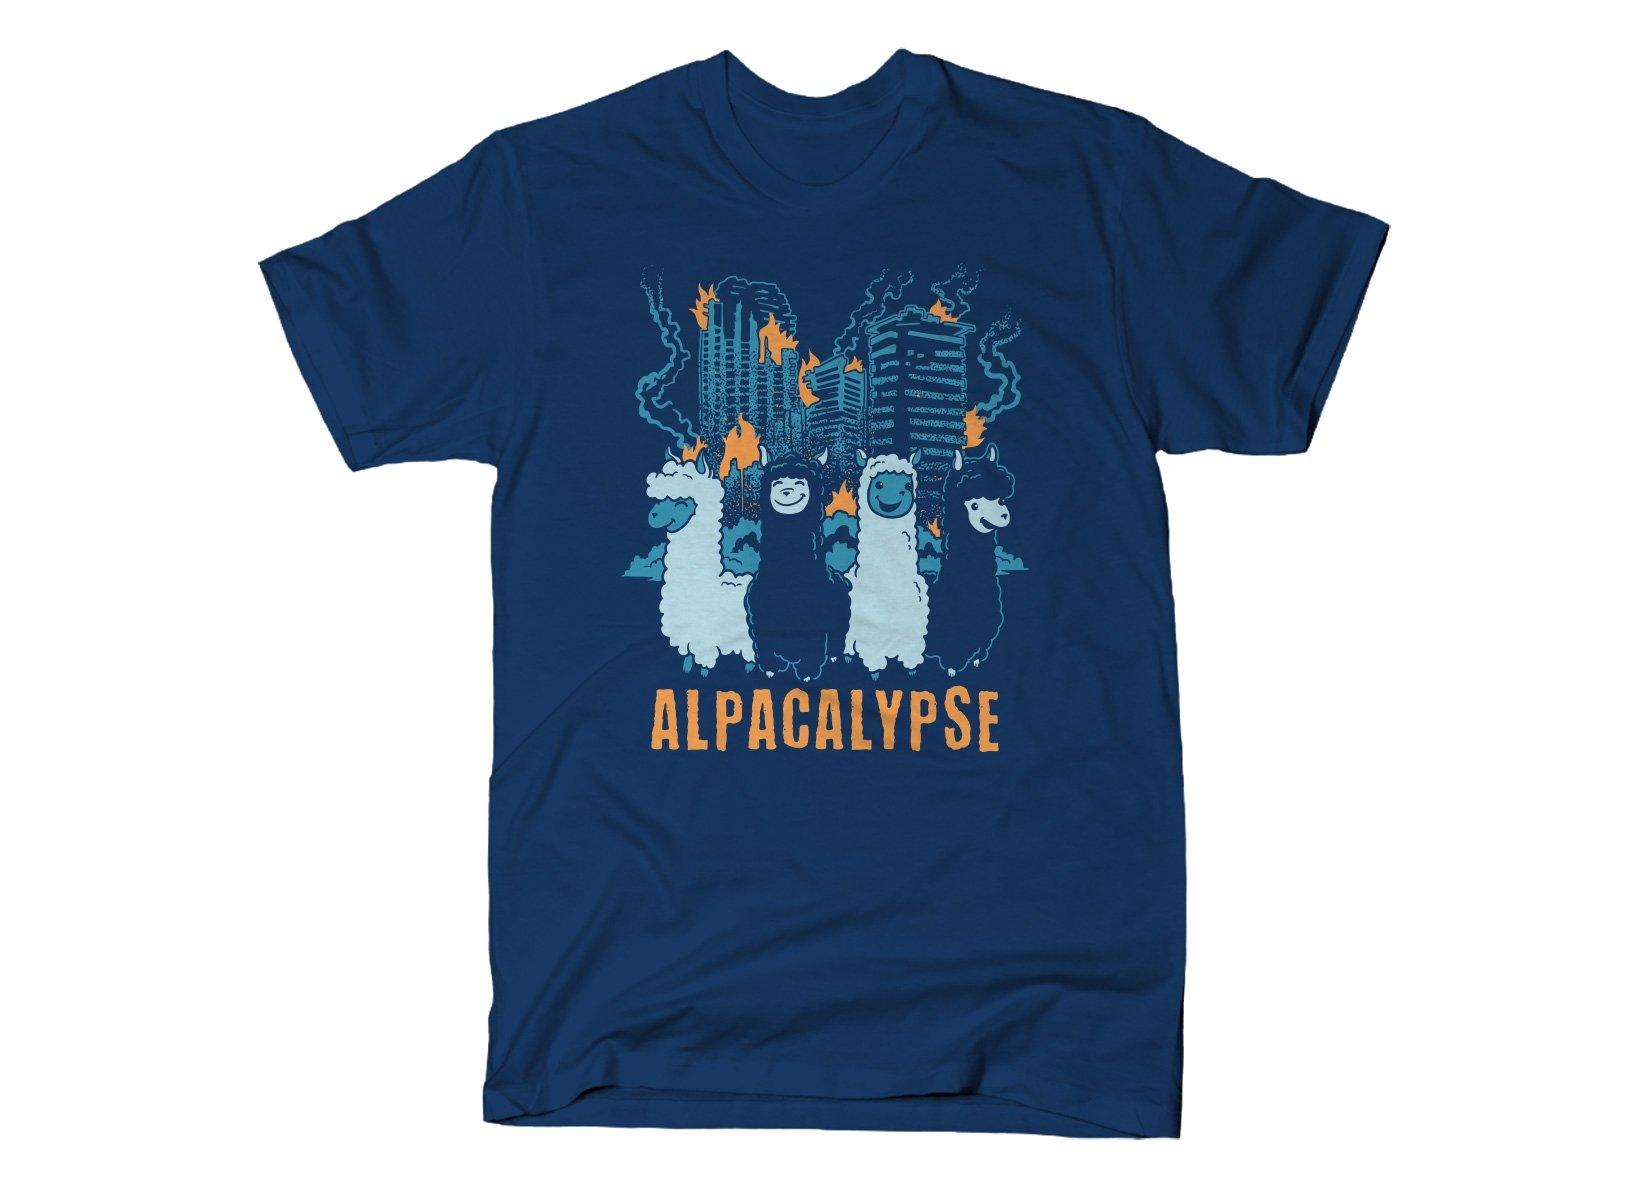 Alpacalypse